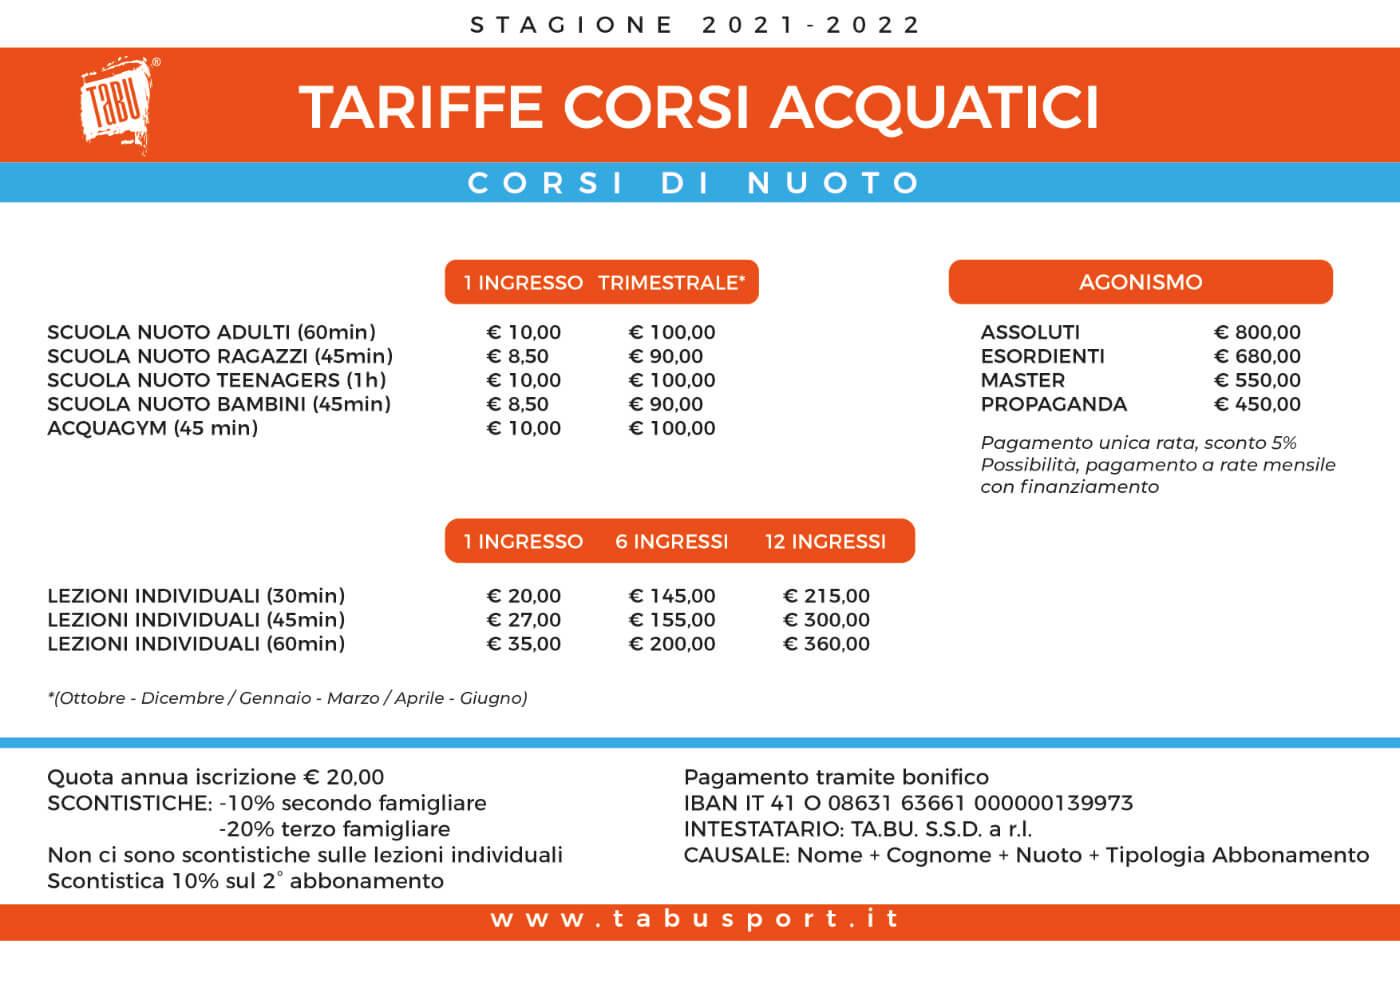 Tariffe corsi acquatici TABU 2021-2022